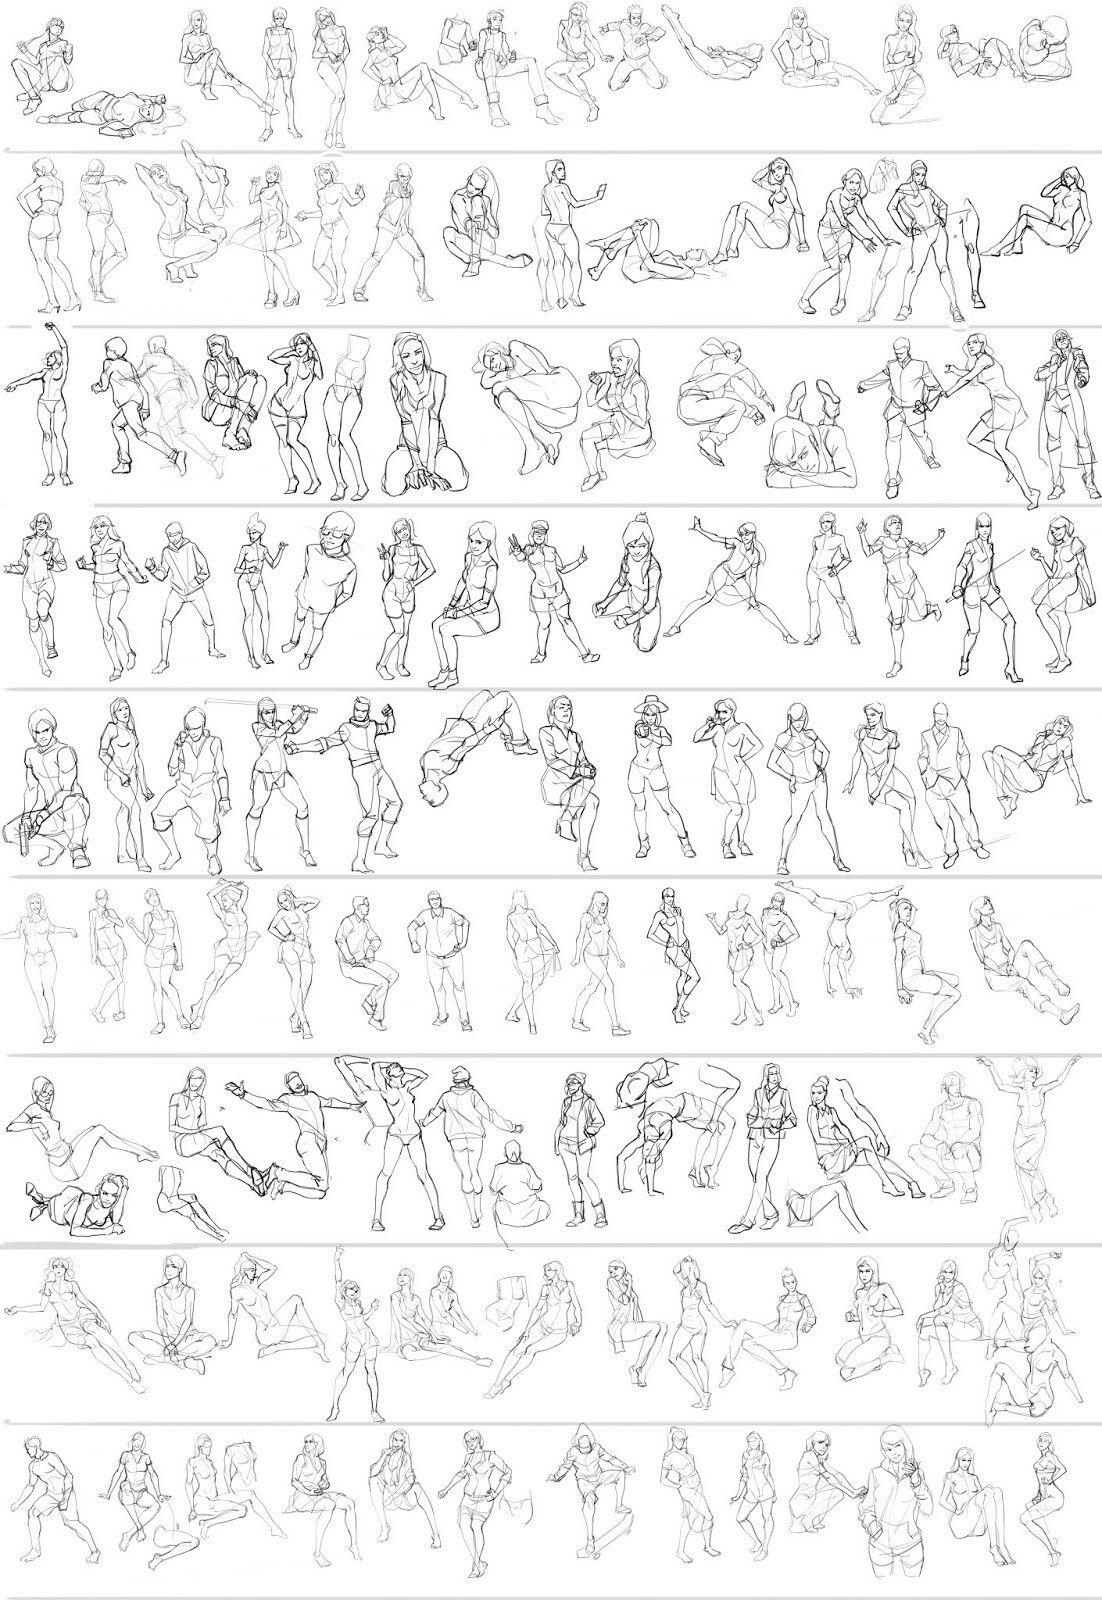 Pin von Elaine Gray auf drawing the human body | Pinterest